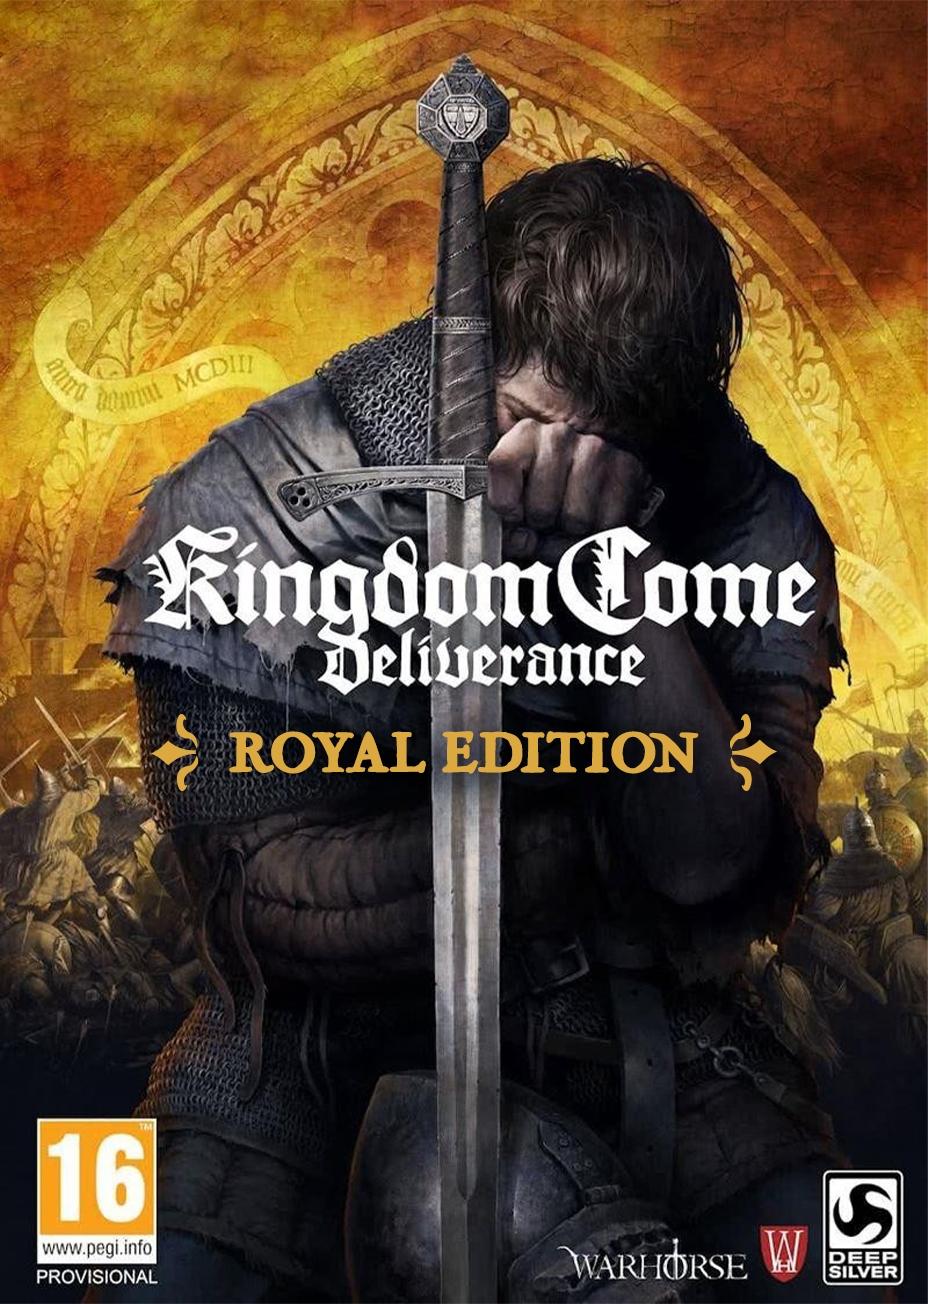 kingdom-come-deliverance-royal-edition-cover.jpg